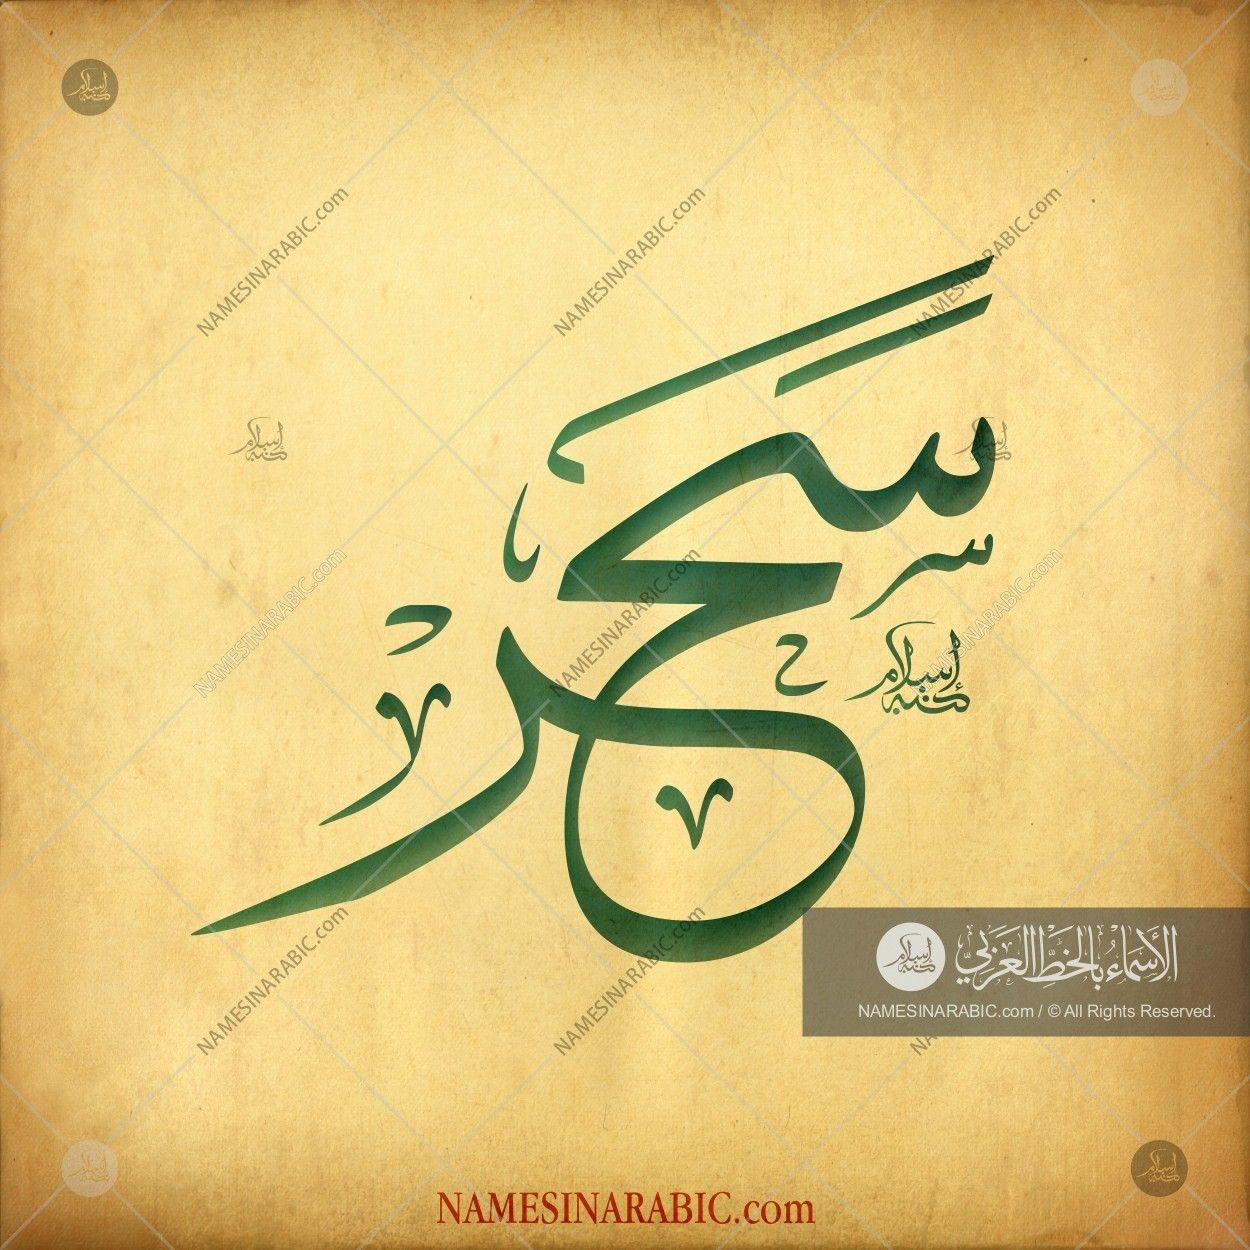 Sahar سحر Names In Arabic Calligraphy Name 3432 Calligraphy Name Calligraphy Islamic Calligraphy